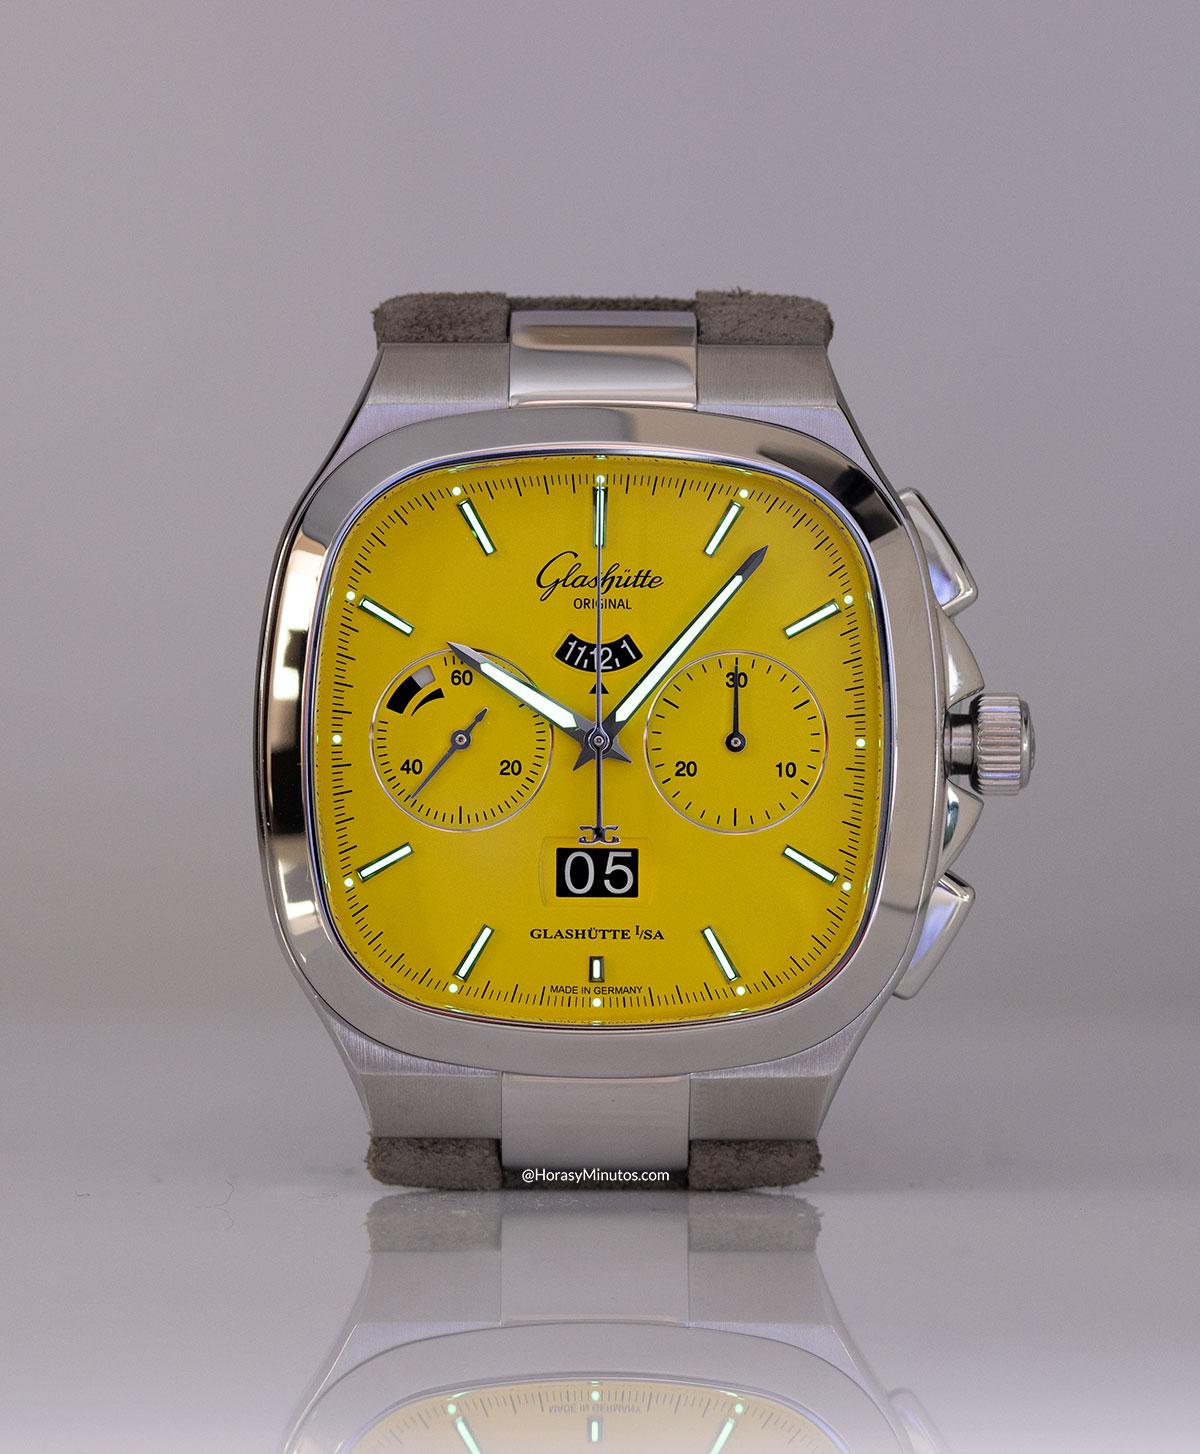 Tratamiento con Super-LumiNova del Glashütte Original Seventies Chronograph Panorama Date